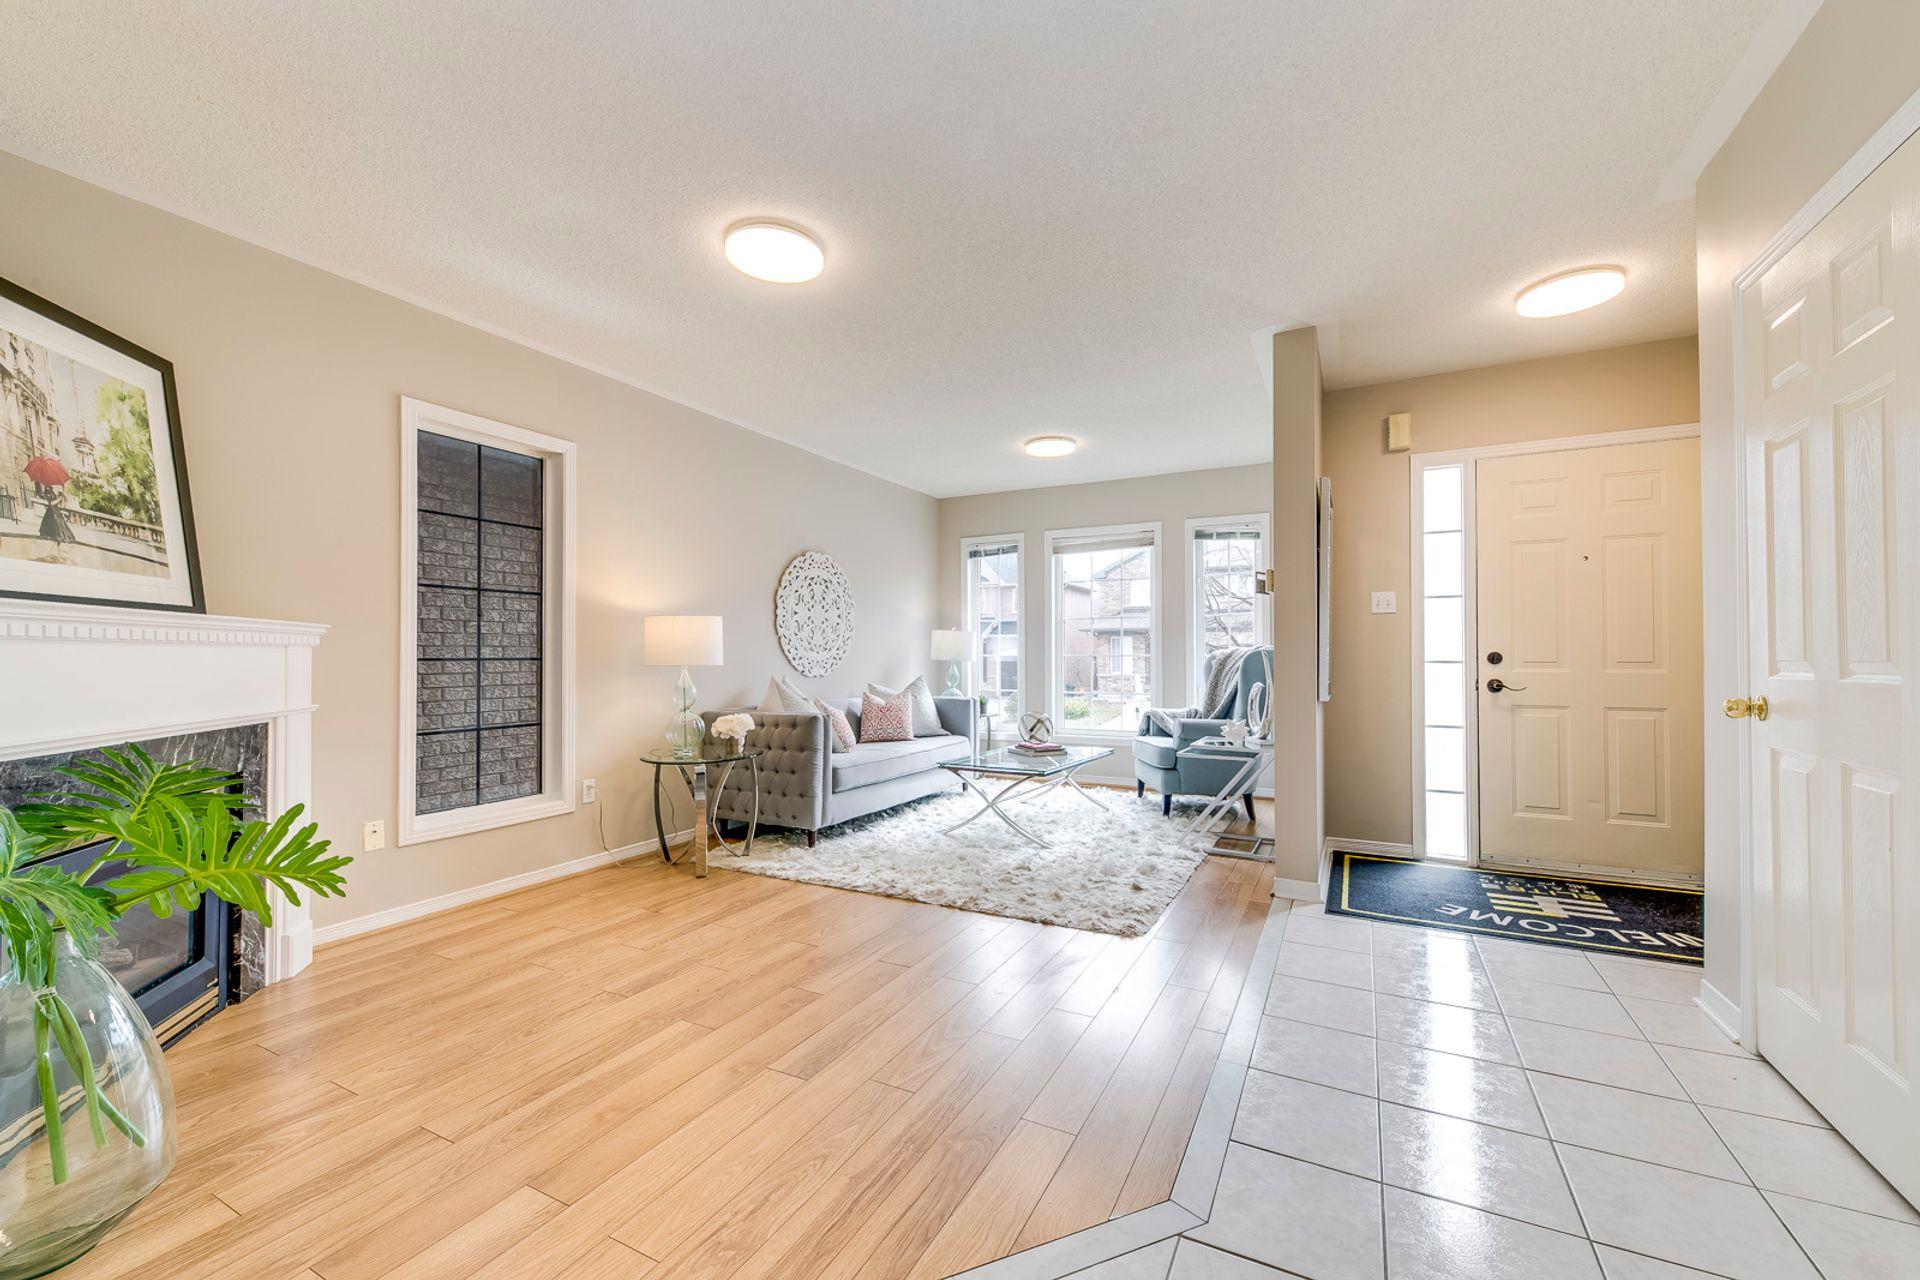 Living Room - 2155 Village Squire Lane, Oakville - Elite3 & Team at 2155 Village Squire Lane, West Oak Trails, Oakville